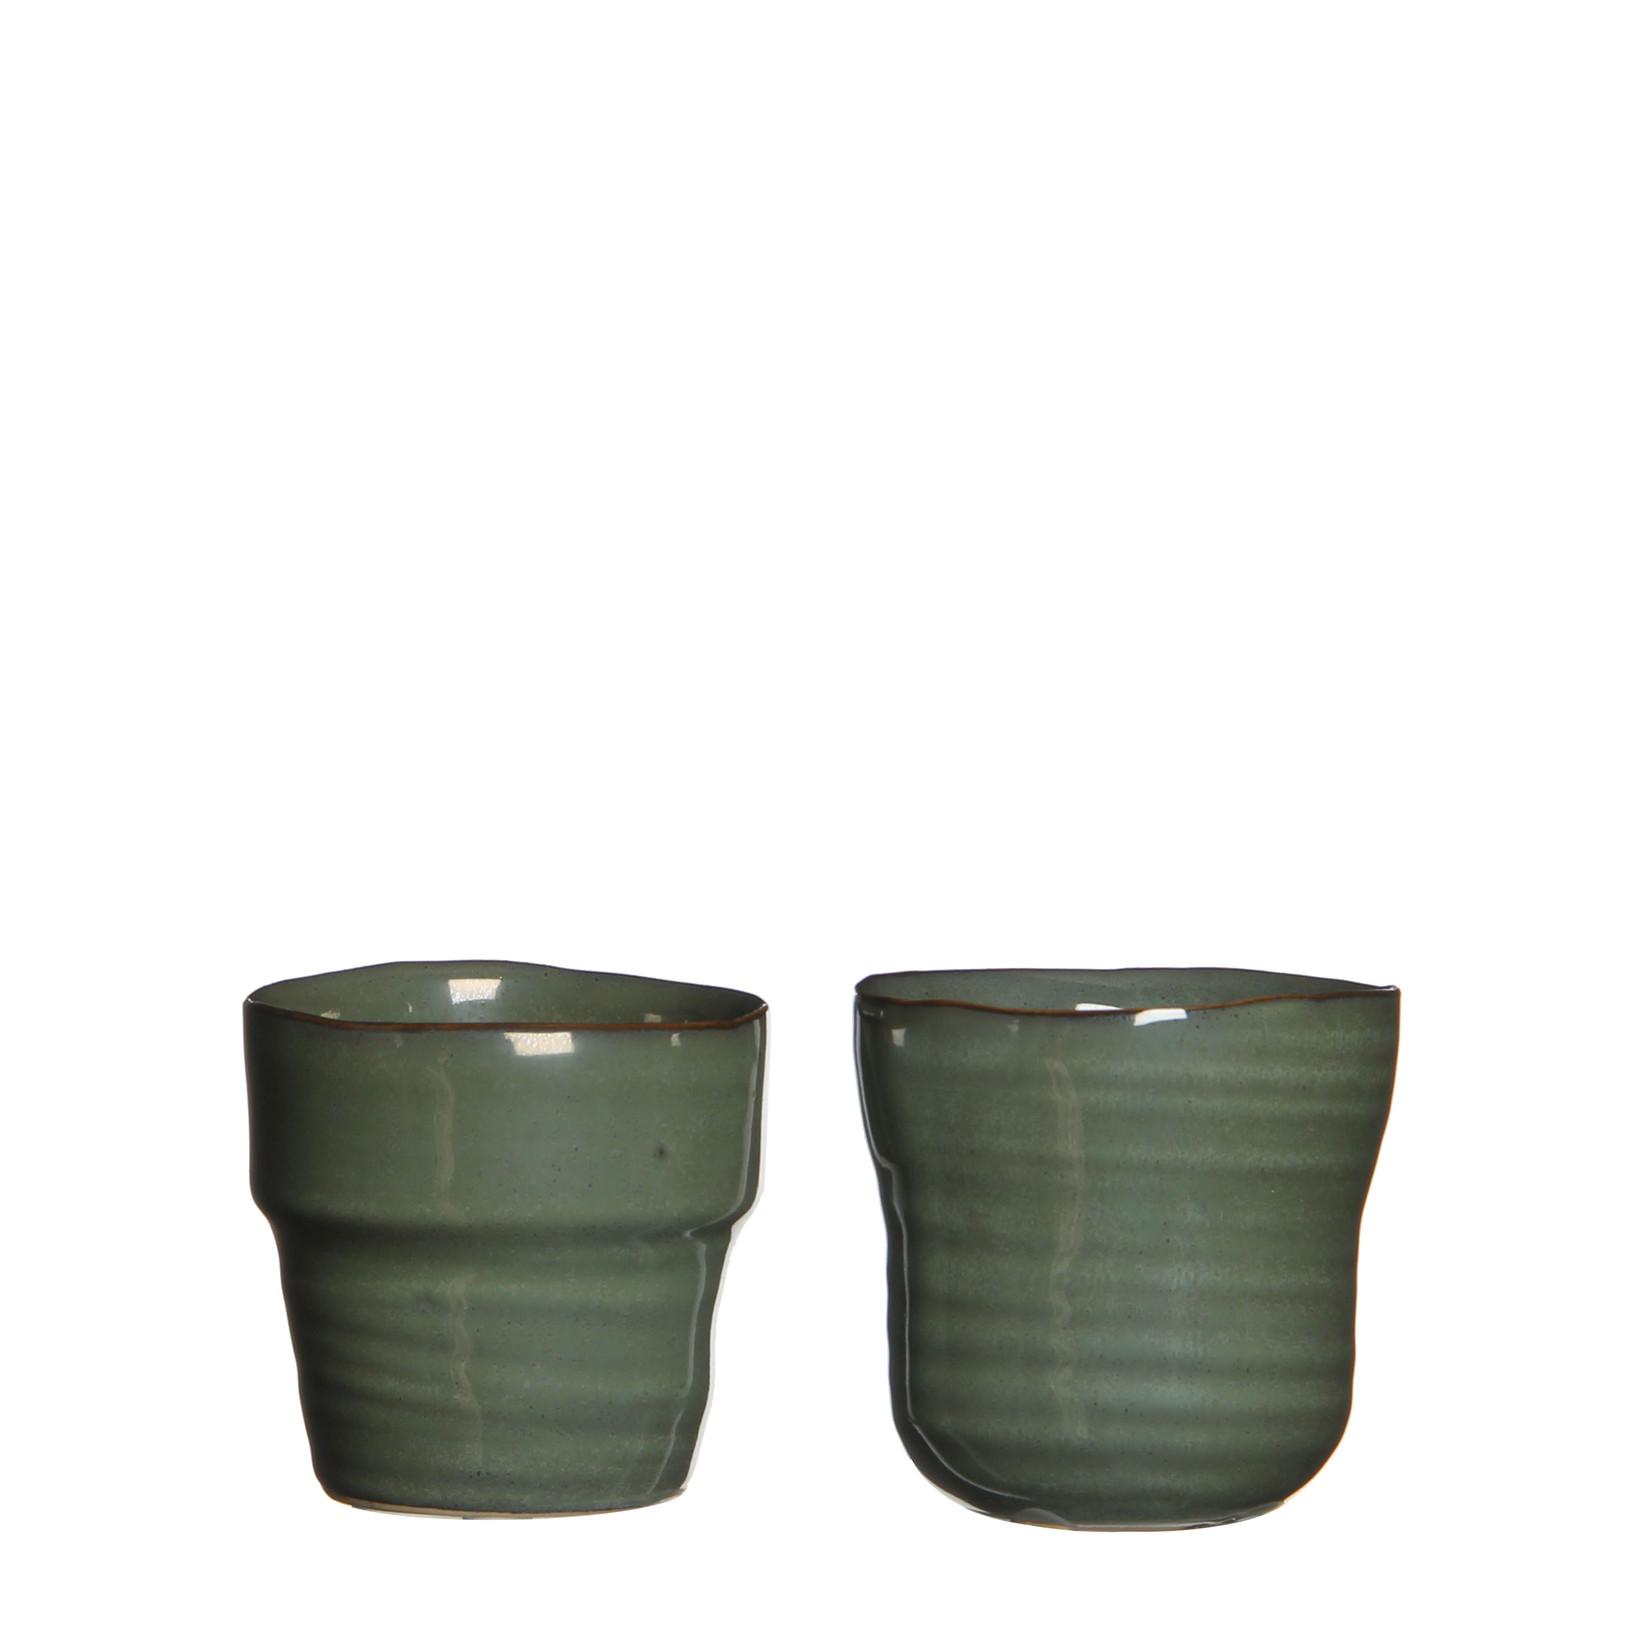 MiCa 1006529 Stef pot round gray